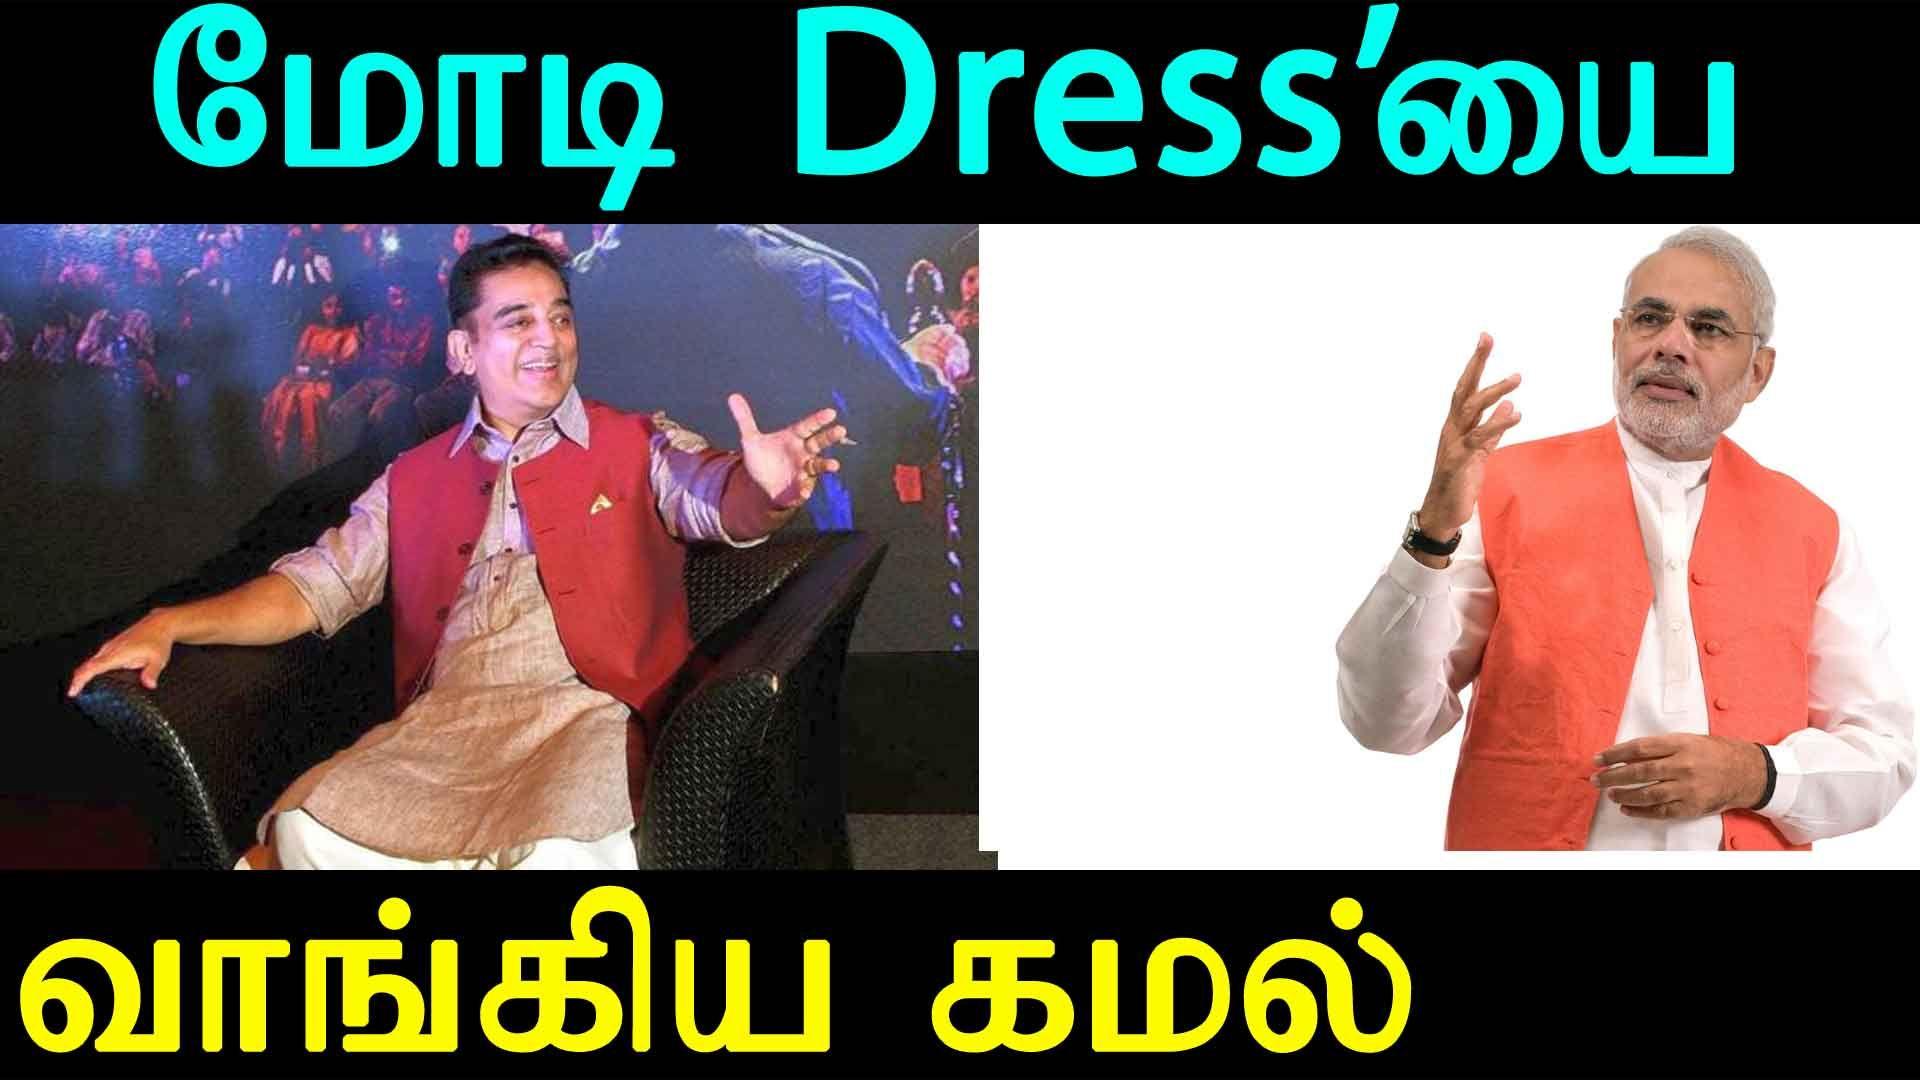 Kamal Haasan Buys PM Modi Dress மோடி Dress'யை வாங்கிய